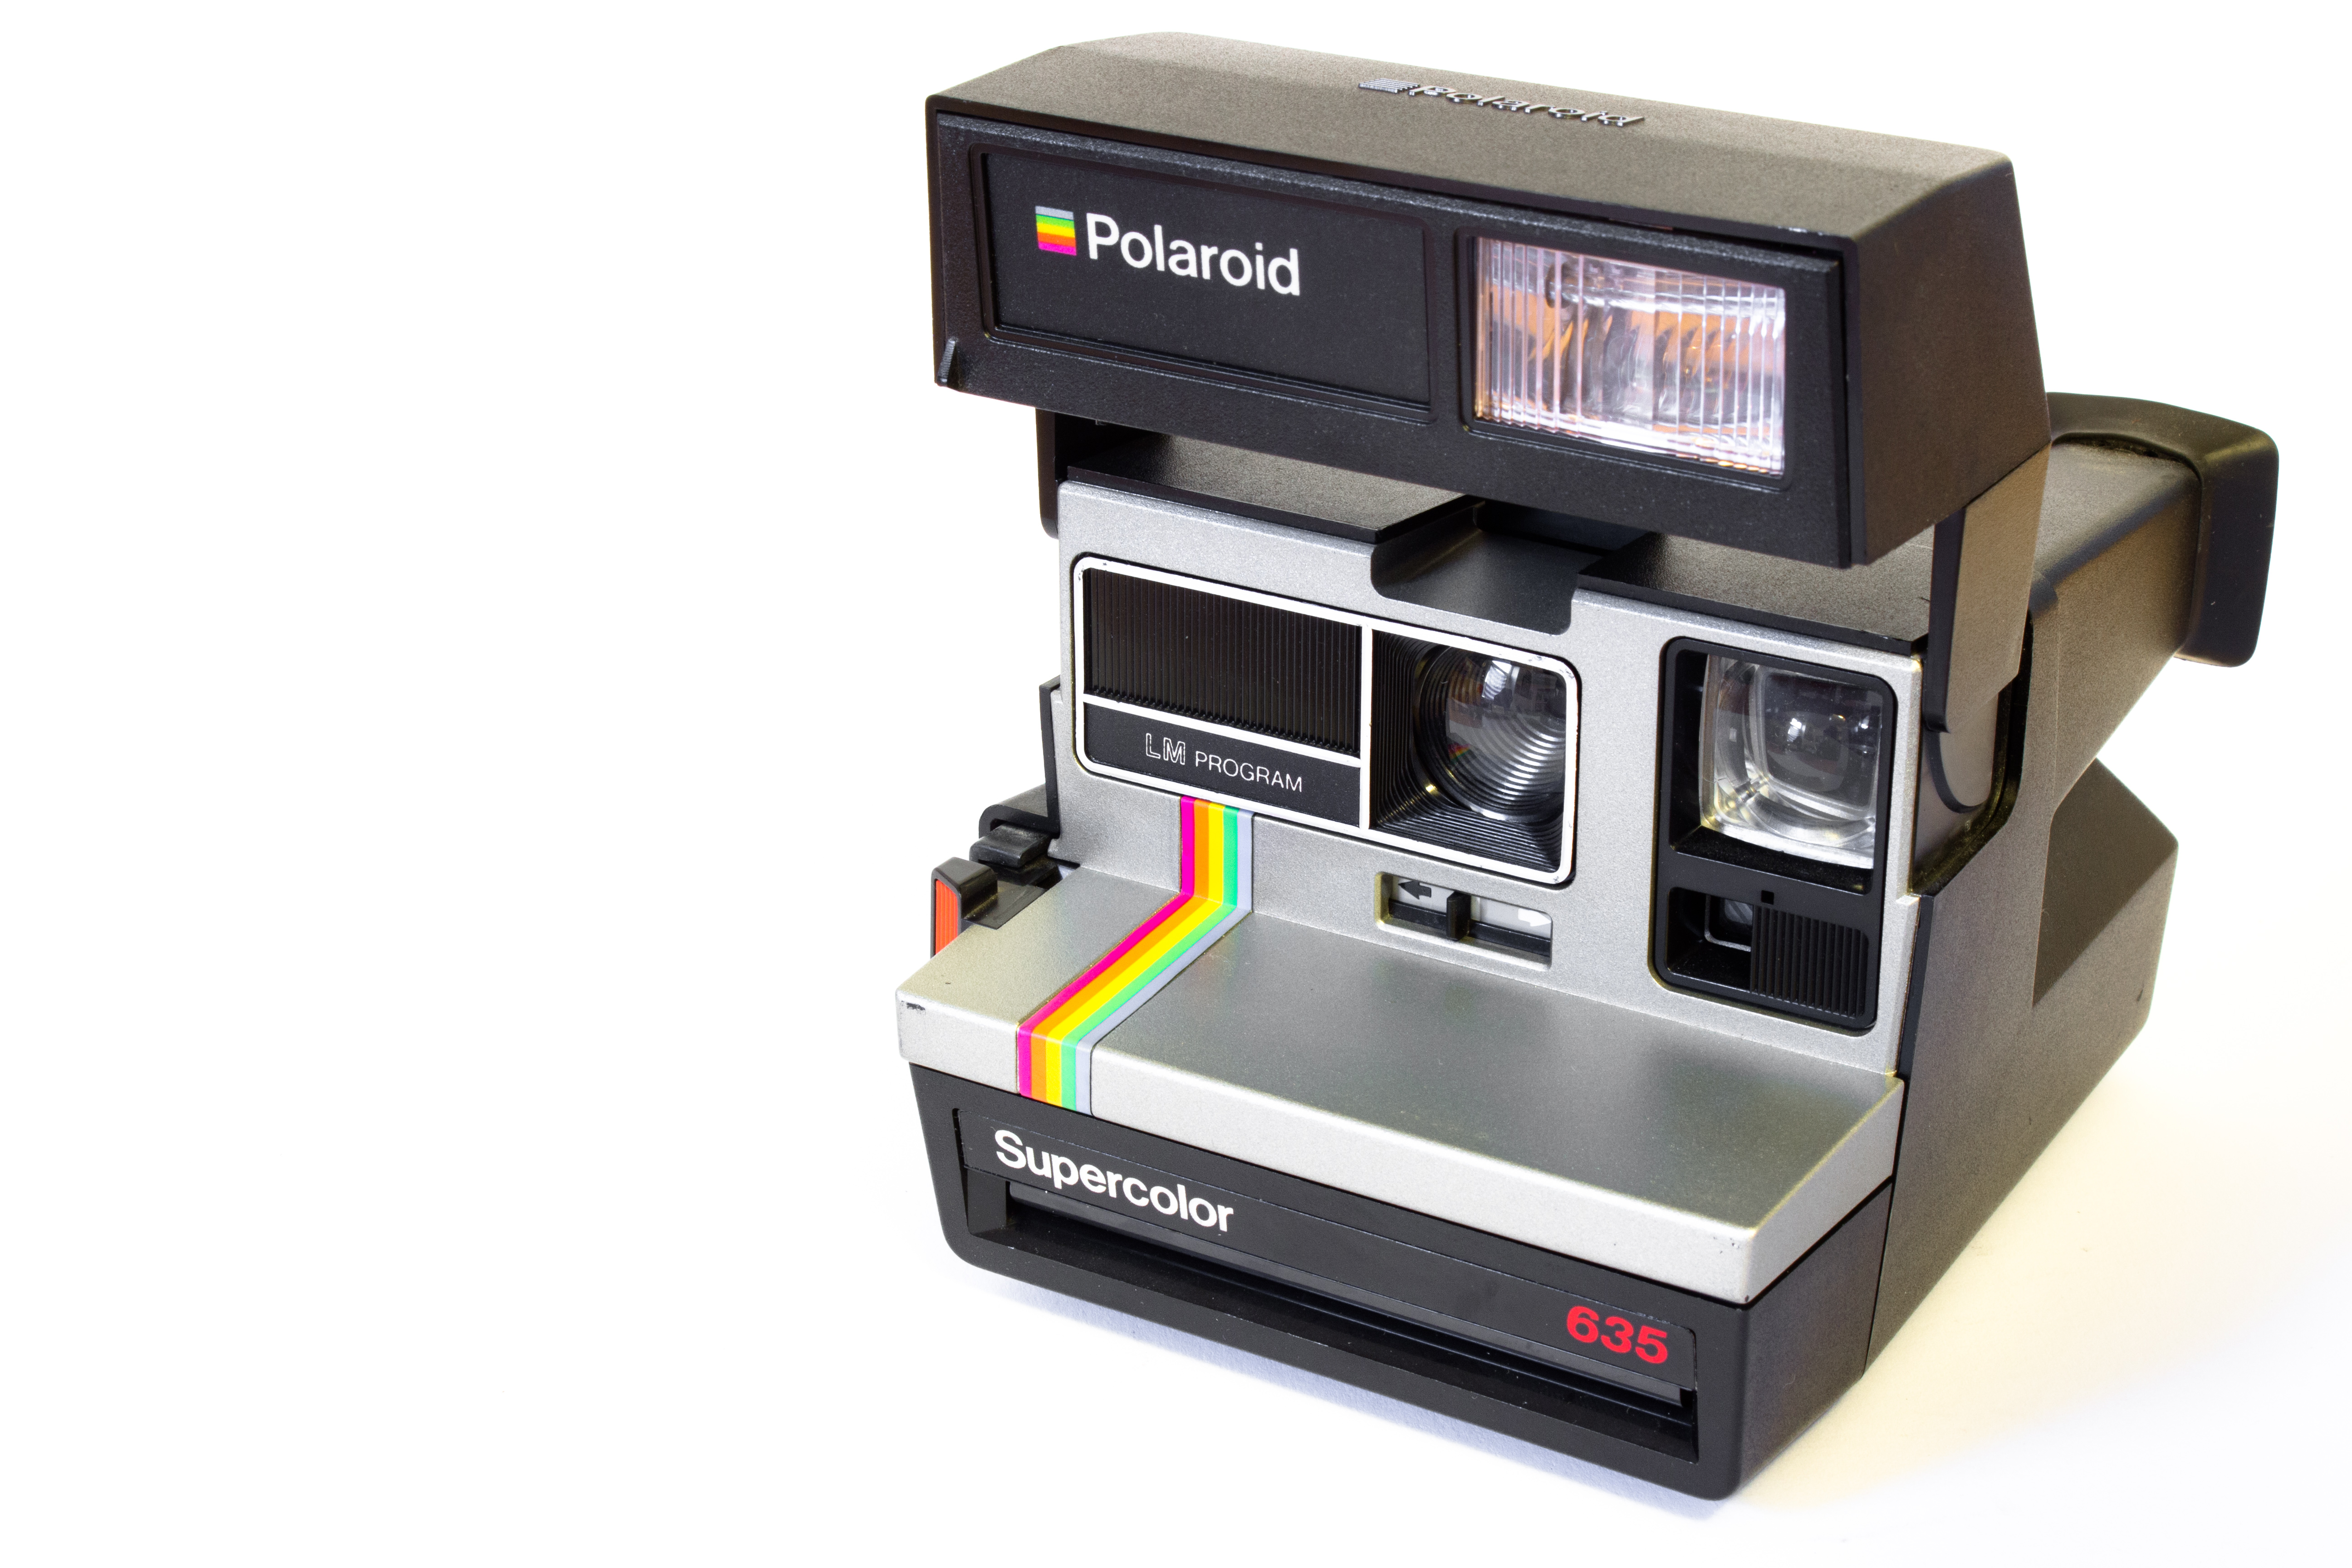 Ultraschall Entfernungsmesser Wiki : Polaroid wikiwand